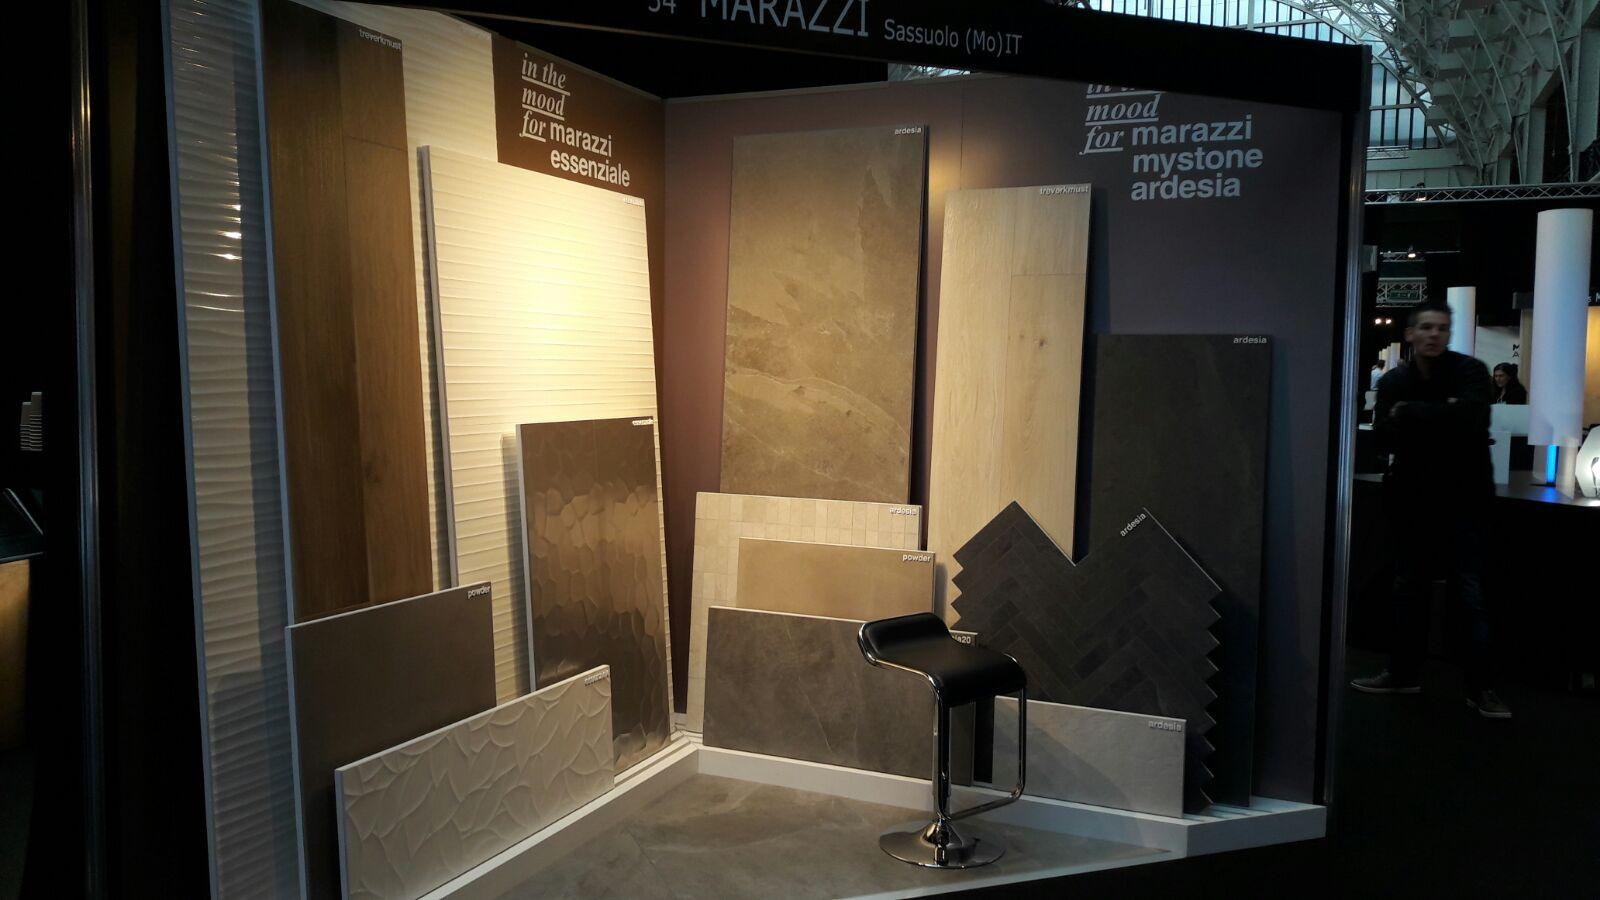 Marazzi in london with architect work marazzi for Architect at work